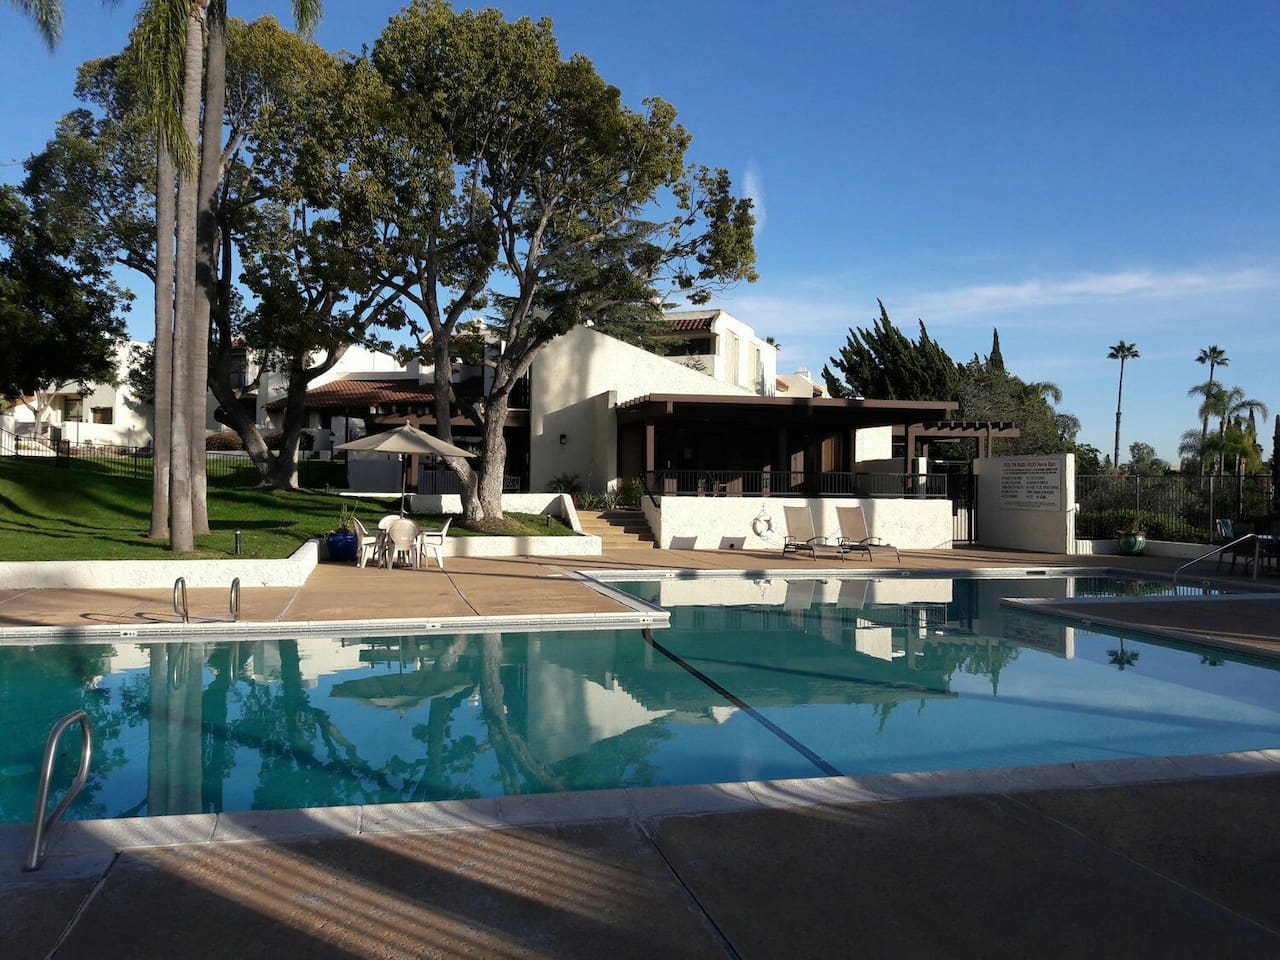 Resort style pool & jacuzzi